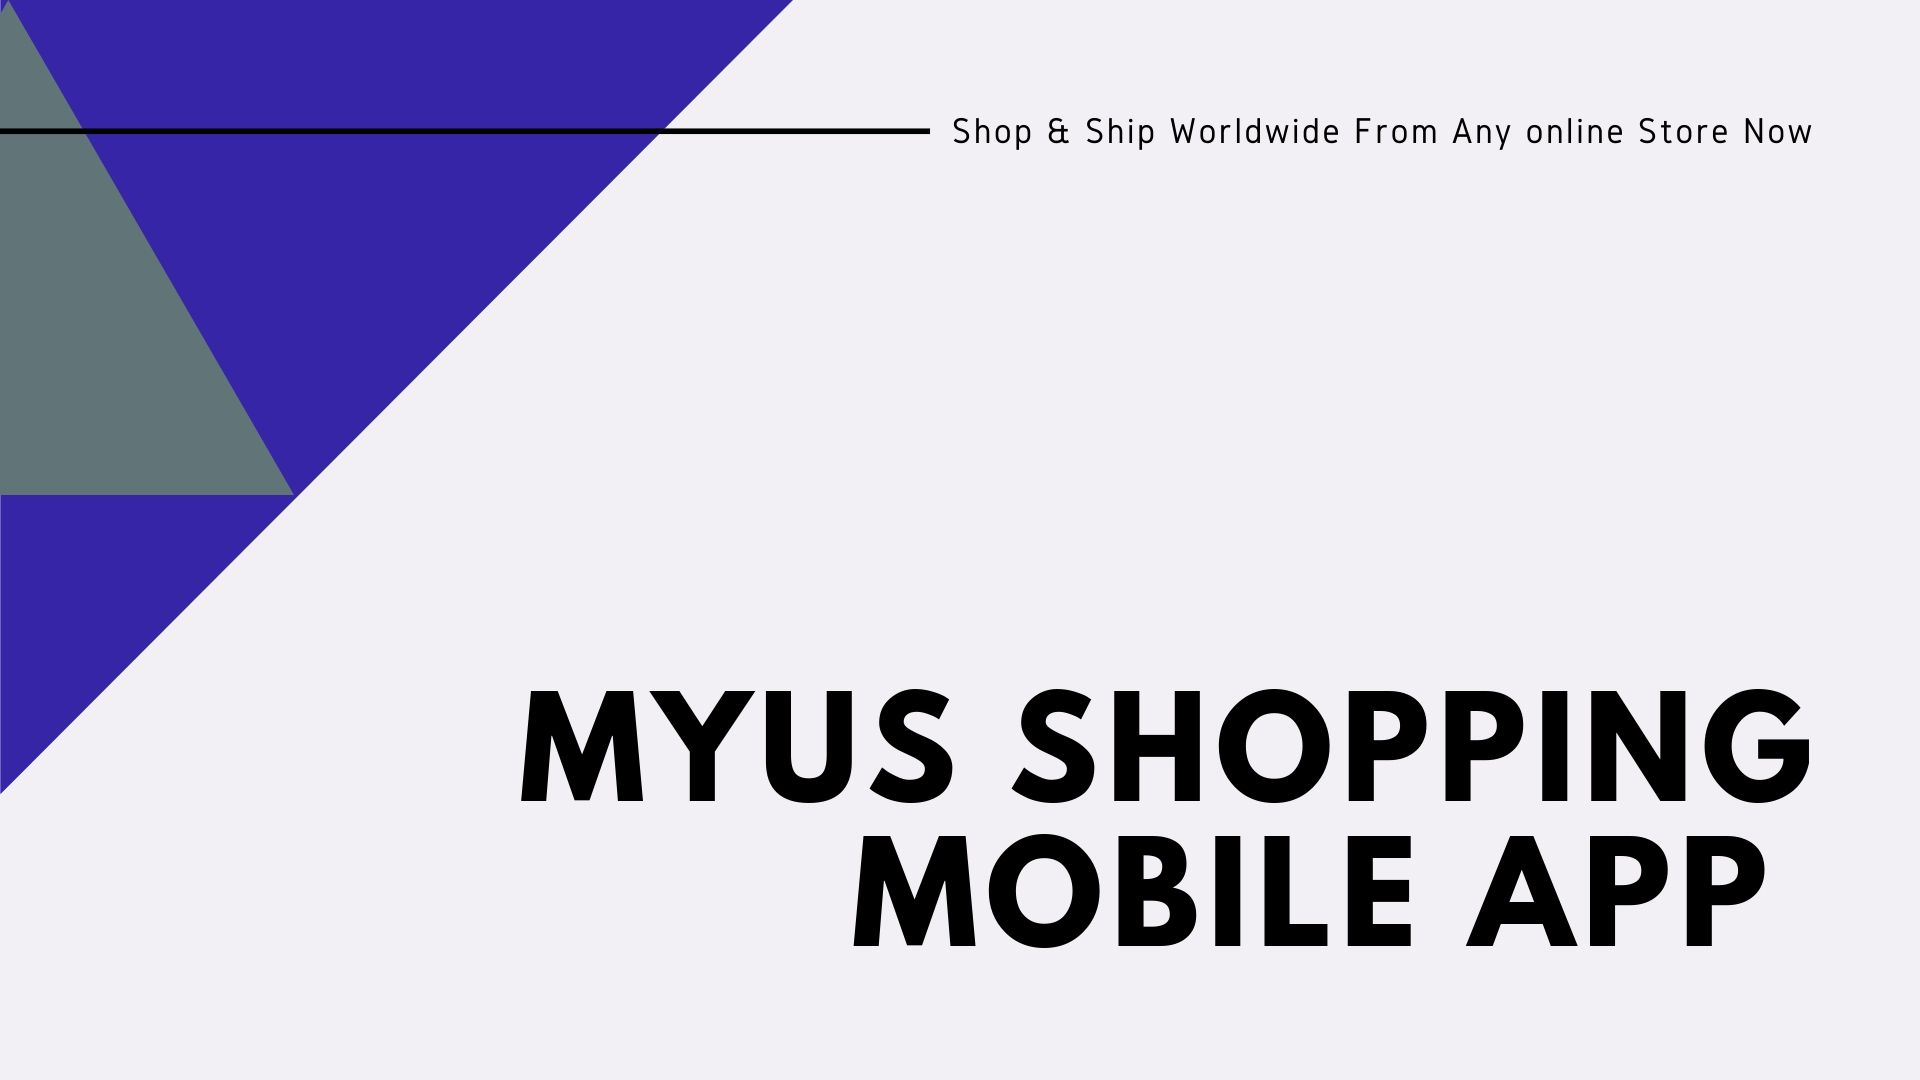 MyUS shopping mobile app